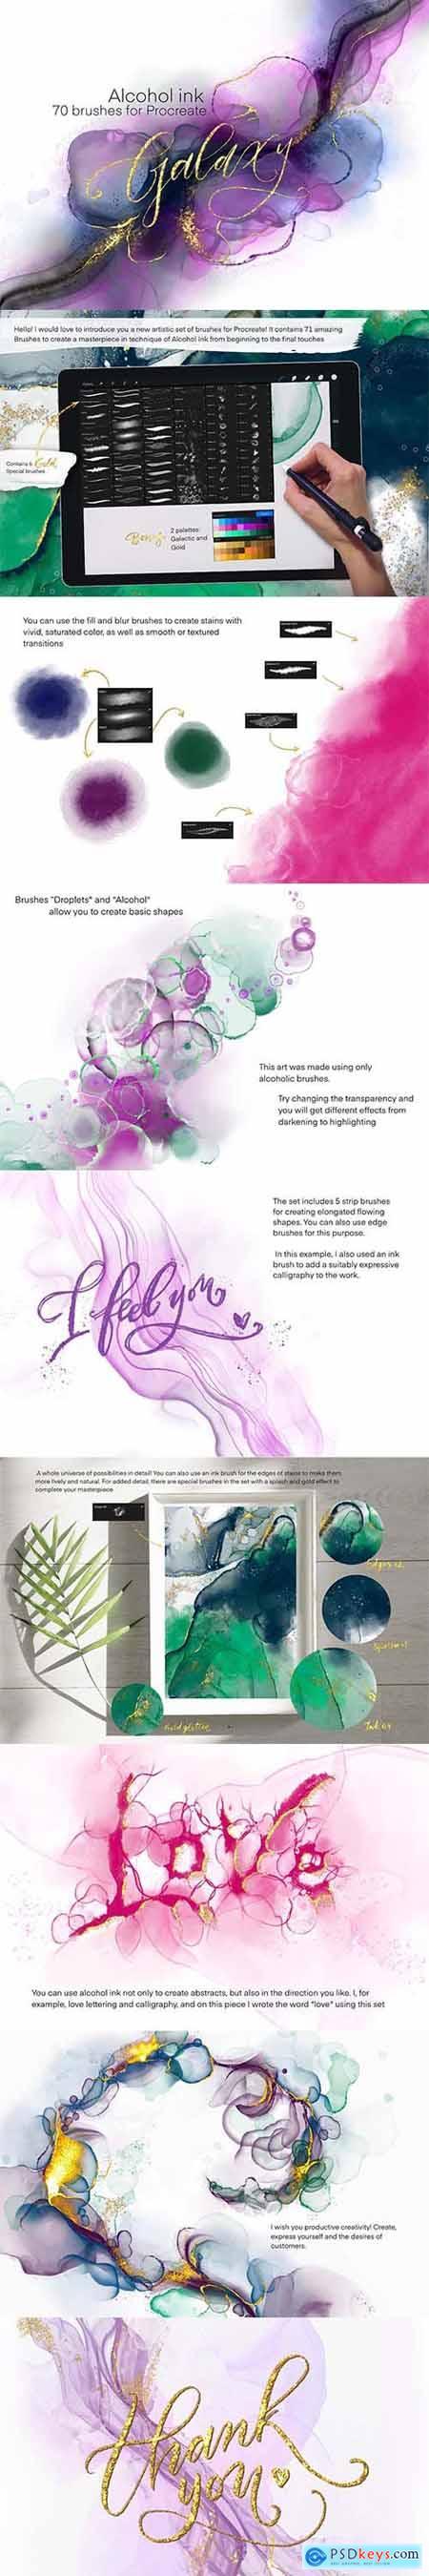 Galaxy Alcohol Ink Brushset 5997008